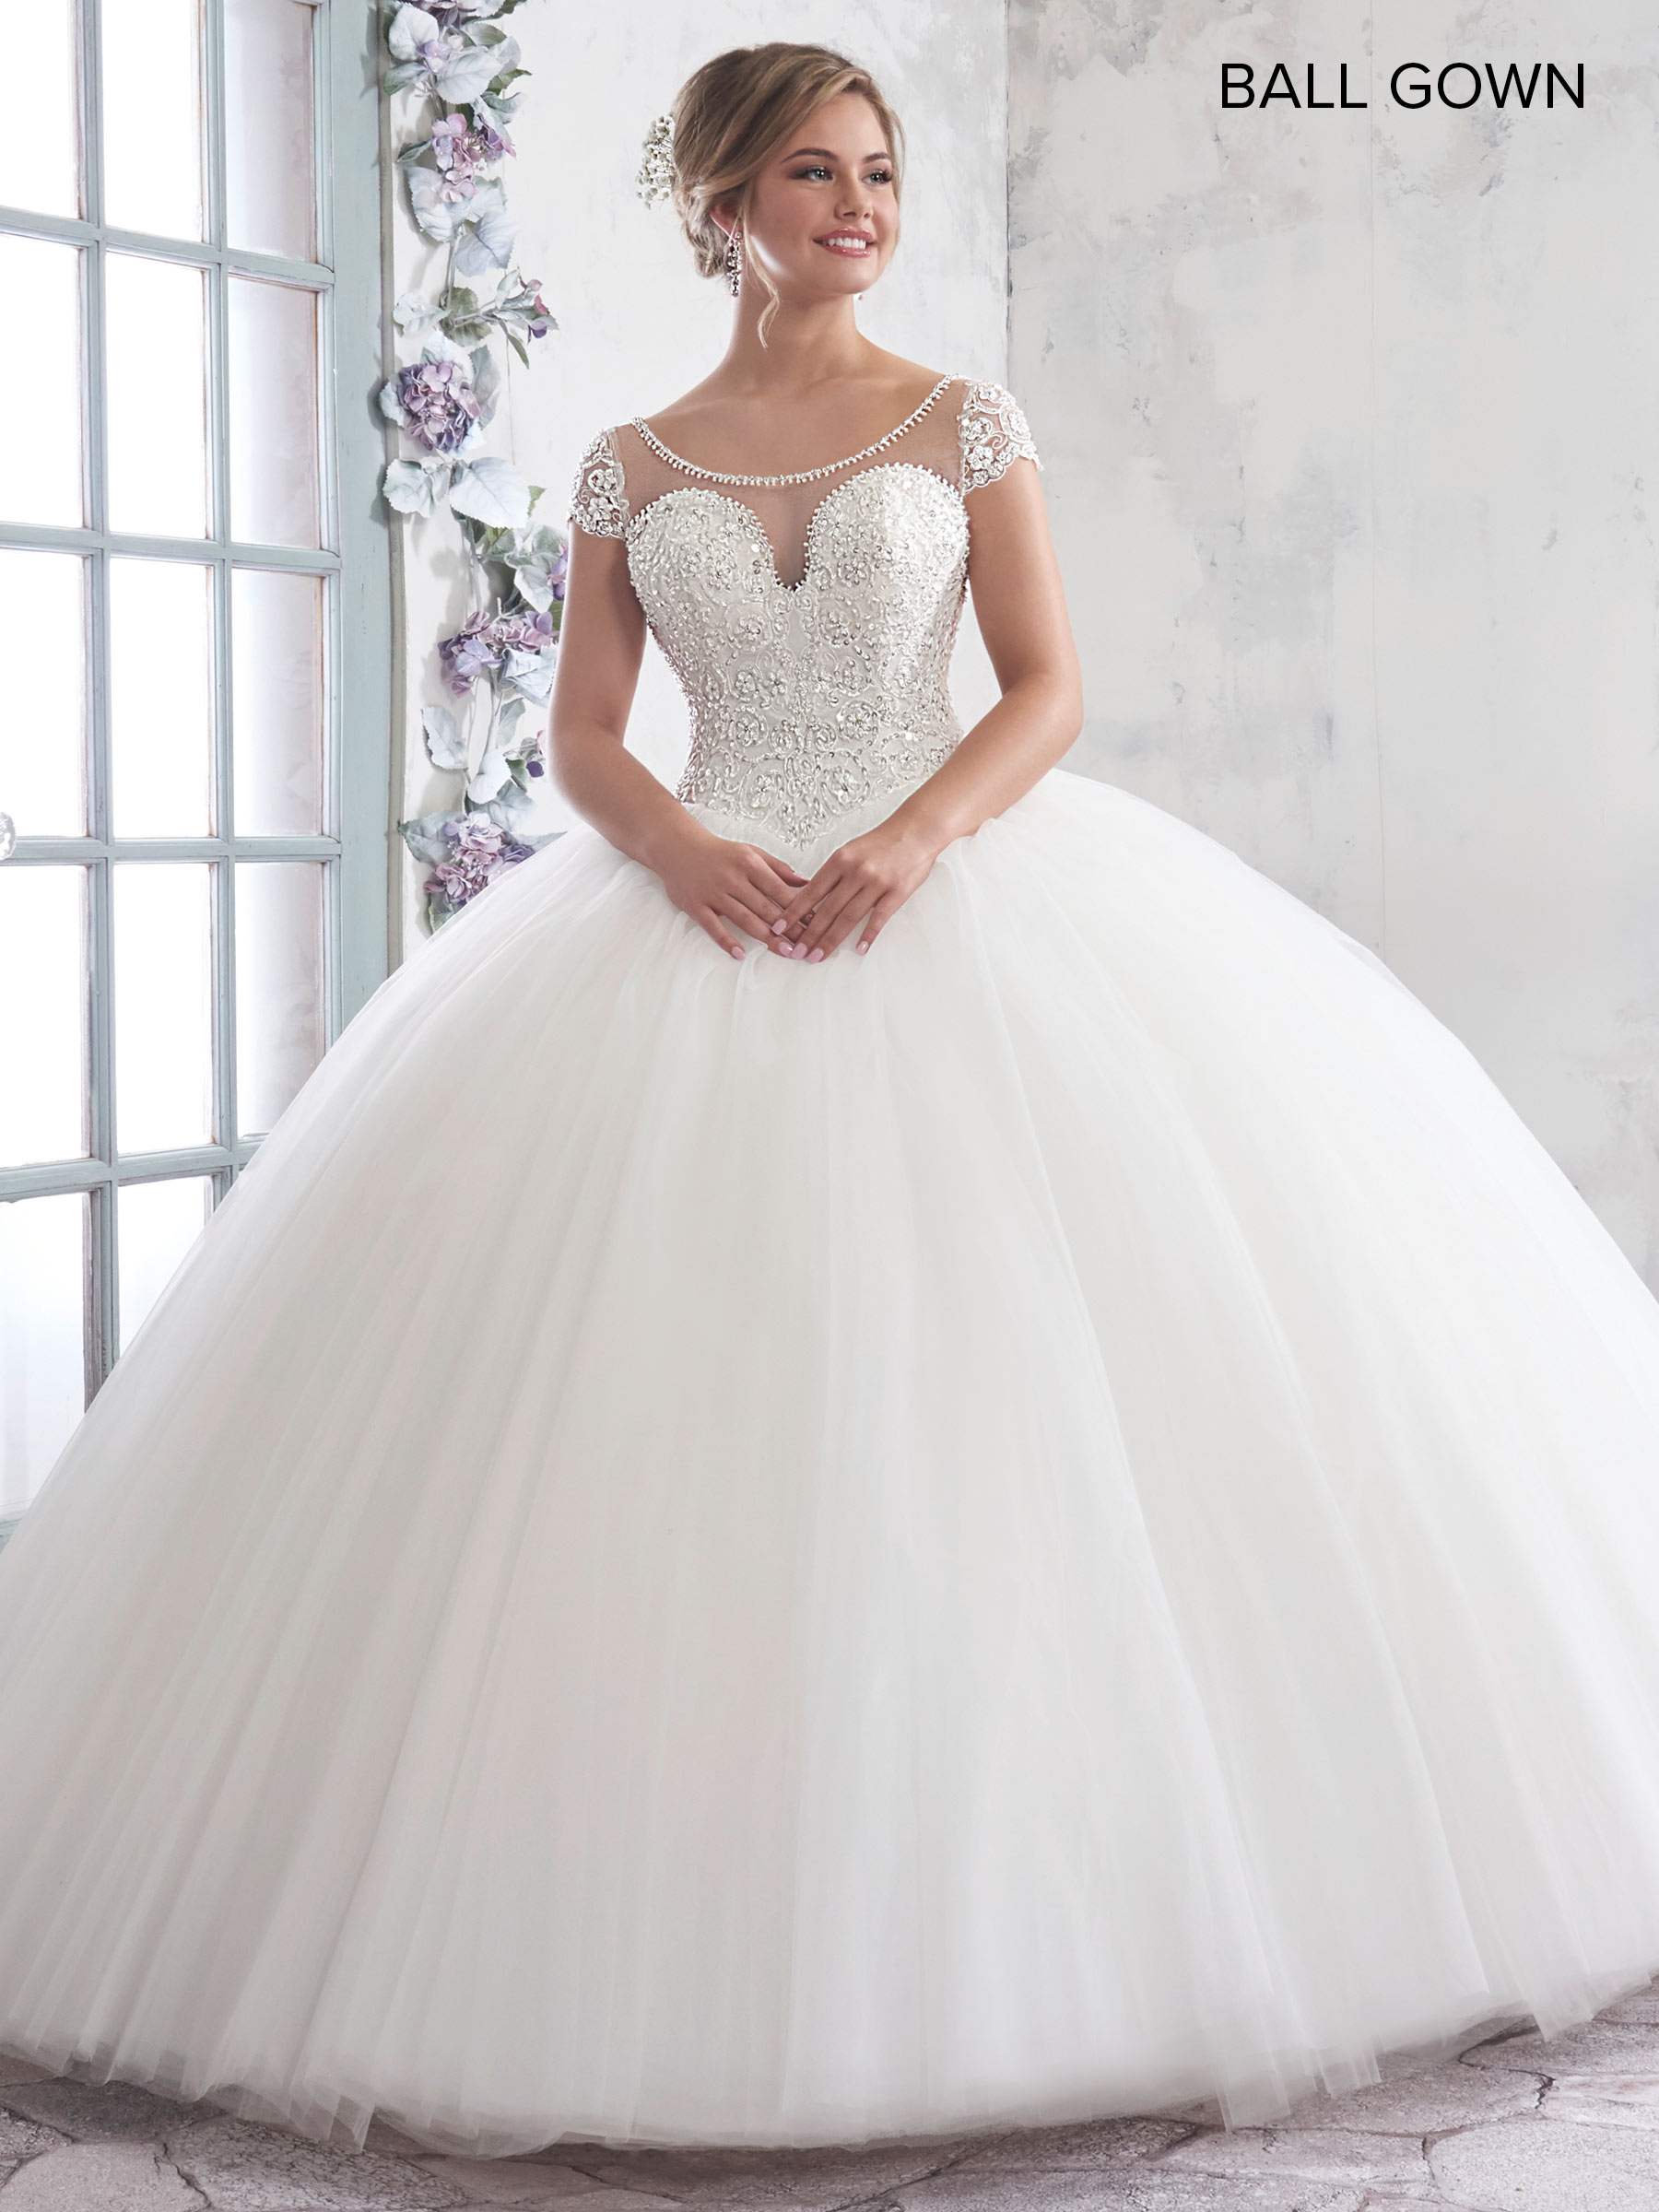 Ball Gown Beaded Appliques Long Sleeve Wedding Dress